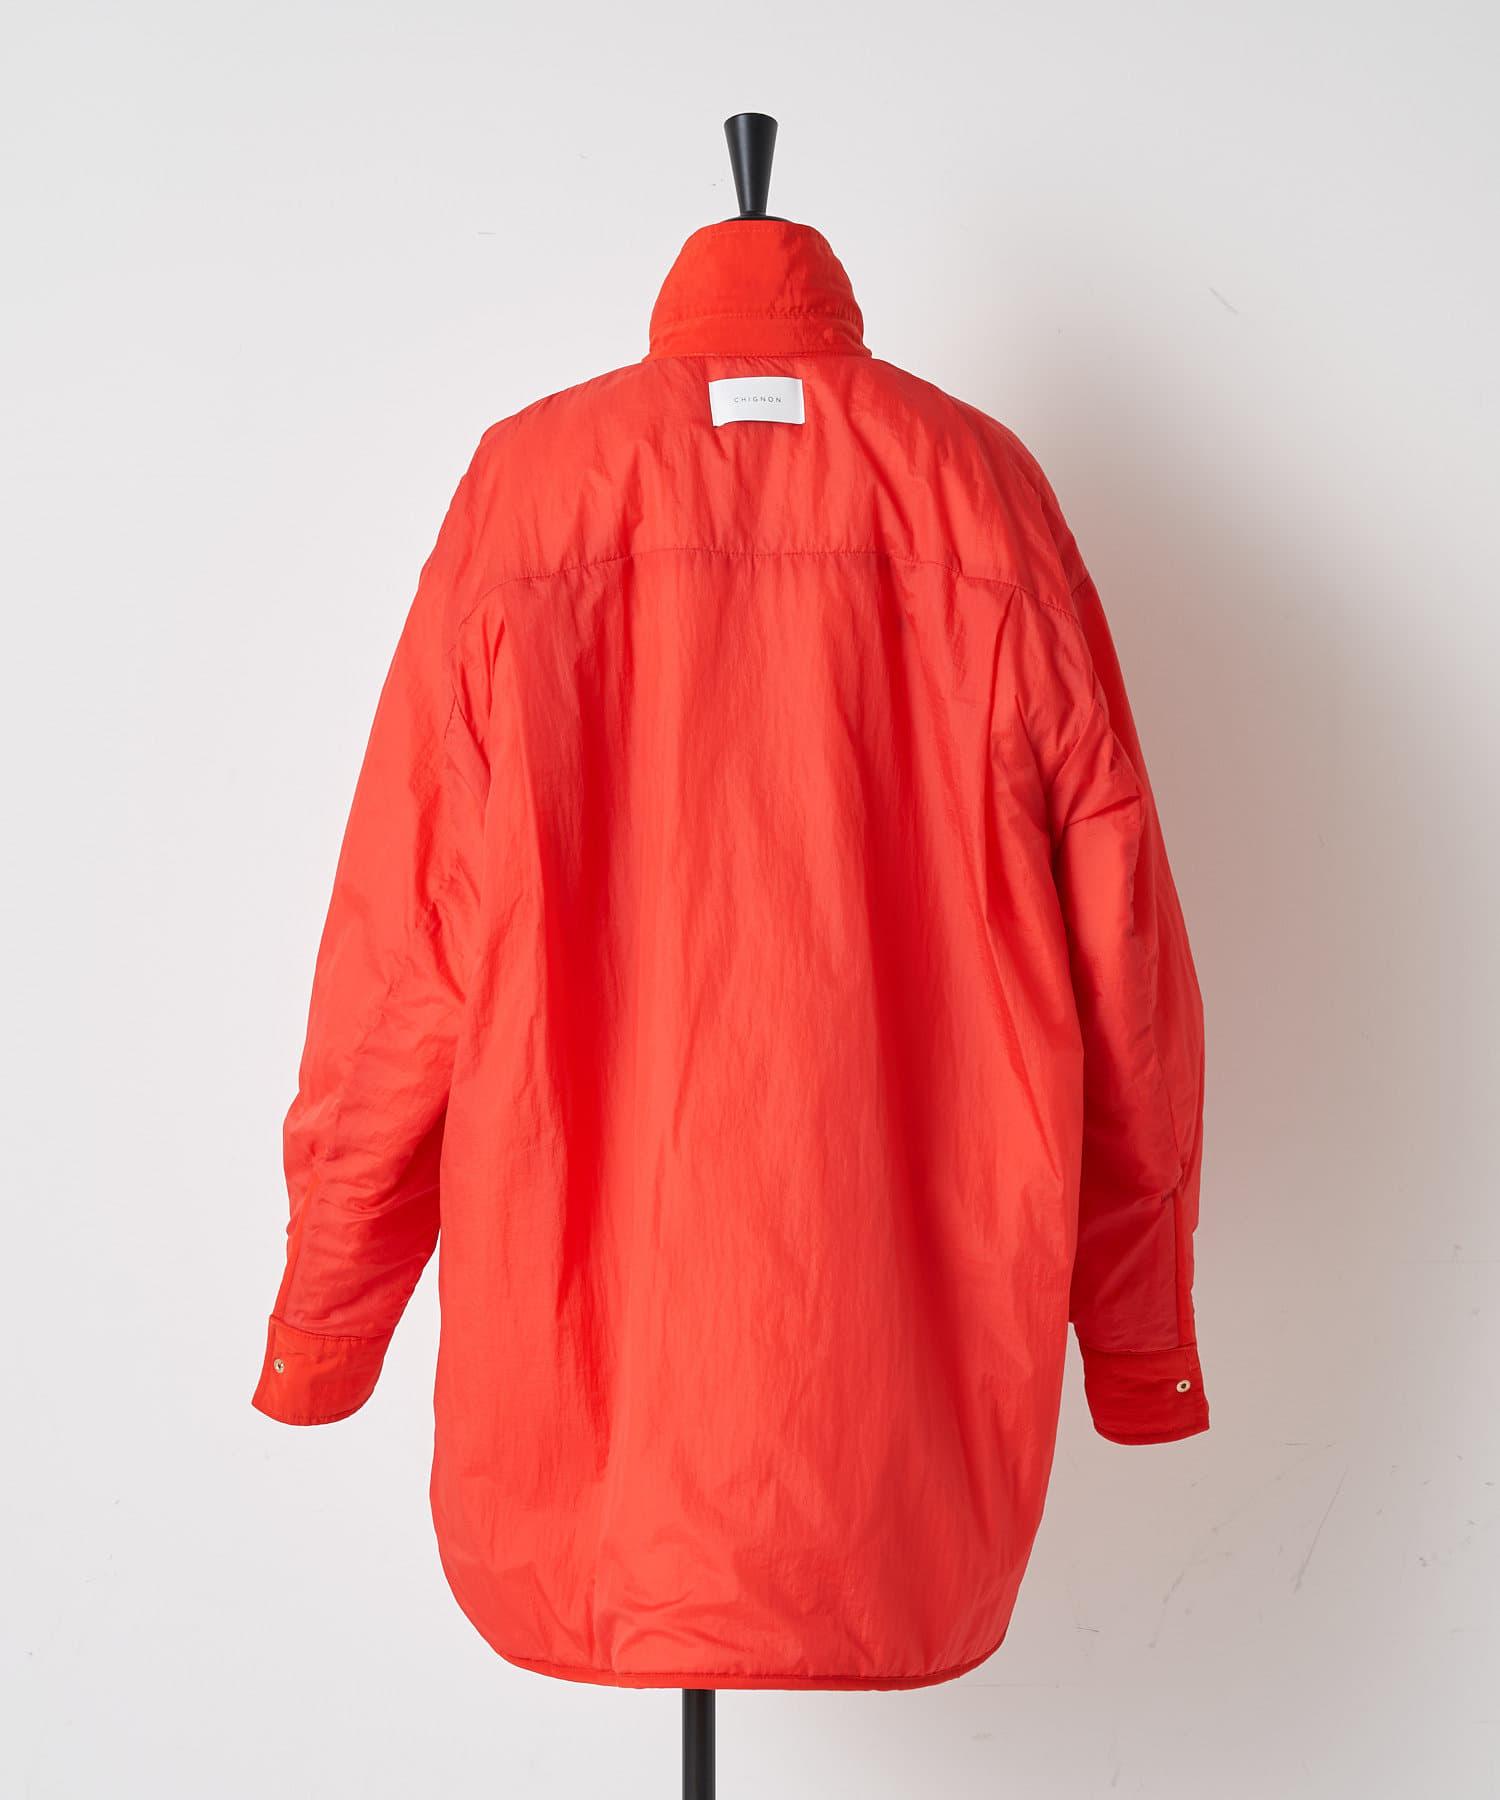 BEARDSLEY(ビアズリー) 《WEB限定・予約》レイヤードキルトジャケット